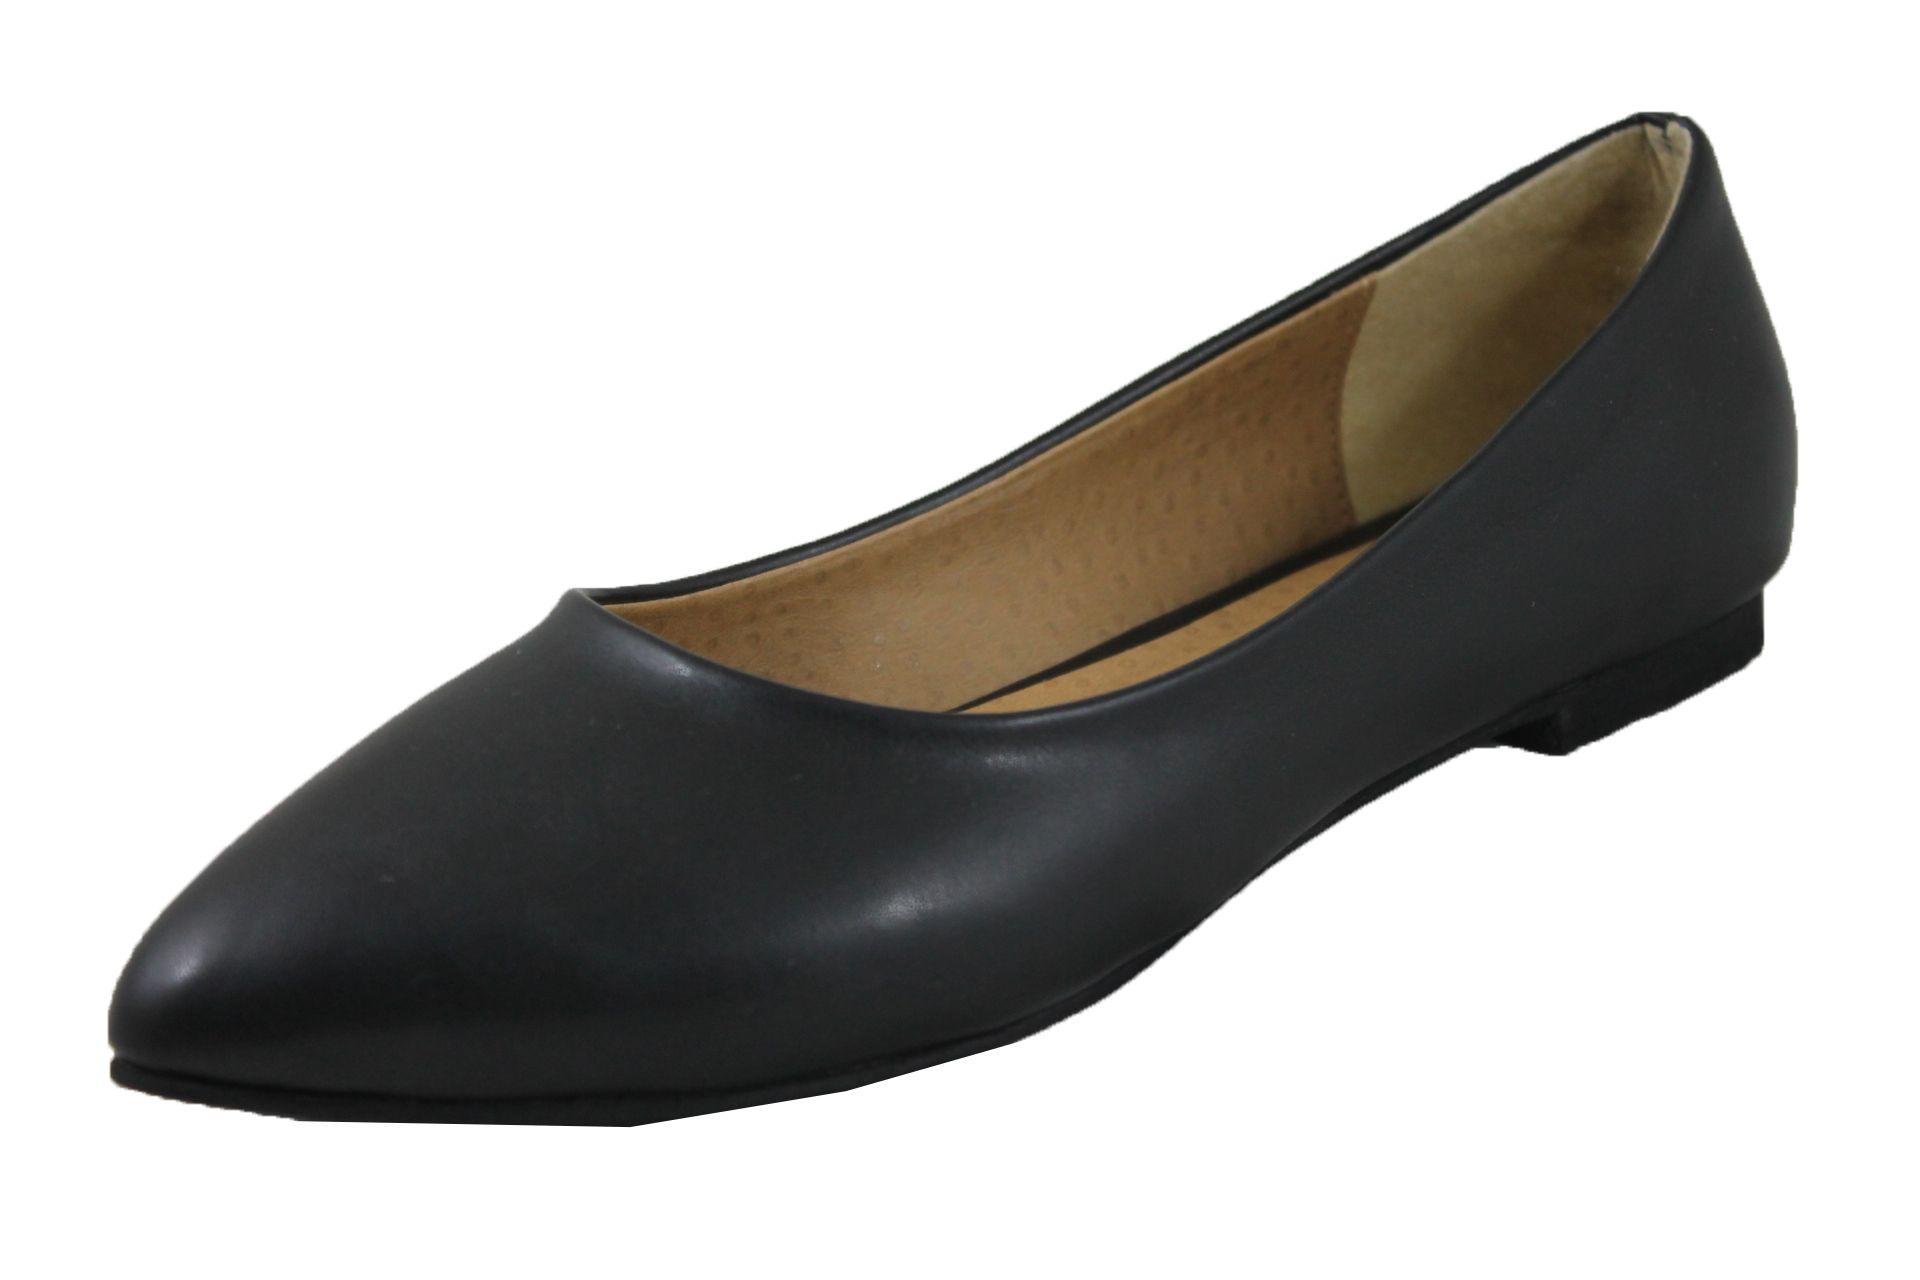 df0ba98f2a4bd سعر Shoebox حذاء كلاسيك فلات جلد طبيعى - اسود فى مصر